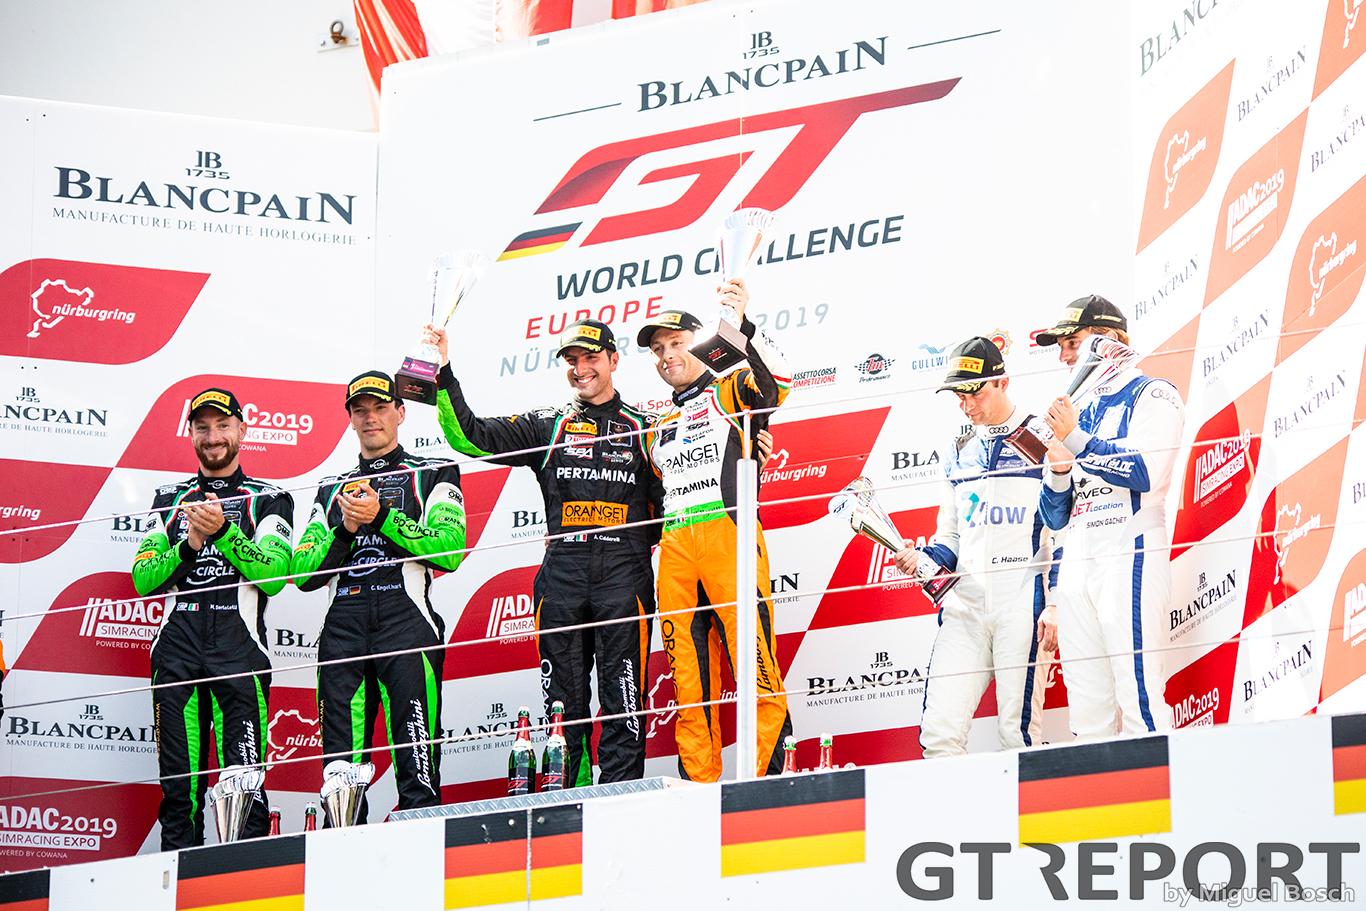 Blancpain GT World Challenge Europe at the Nürburgring